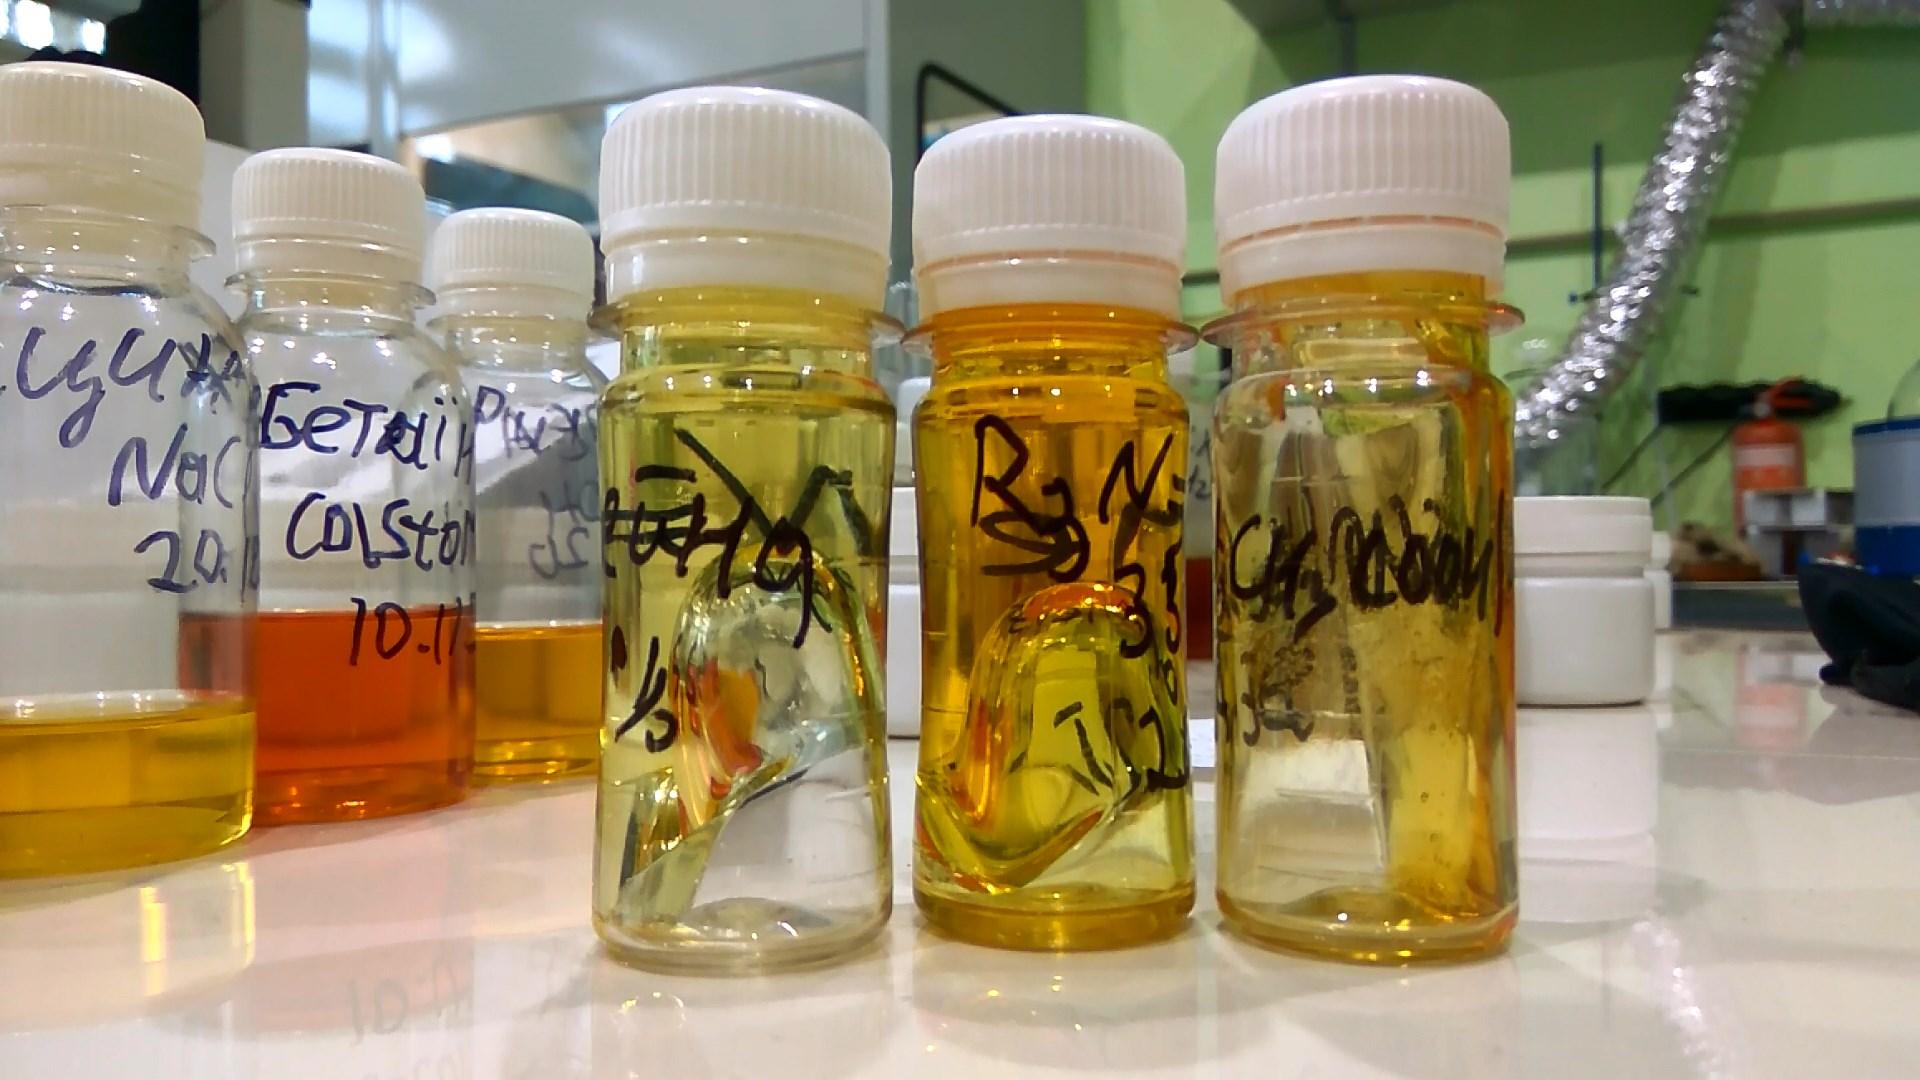 Оксиды аминов (N-оксиды): синтез. Amine-N-oxides: synthesis